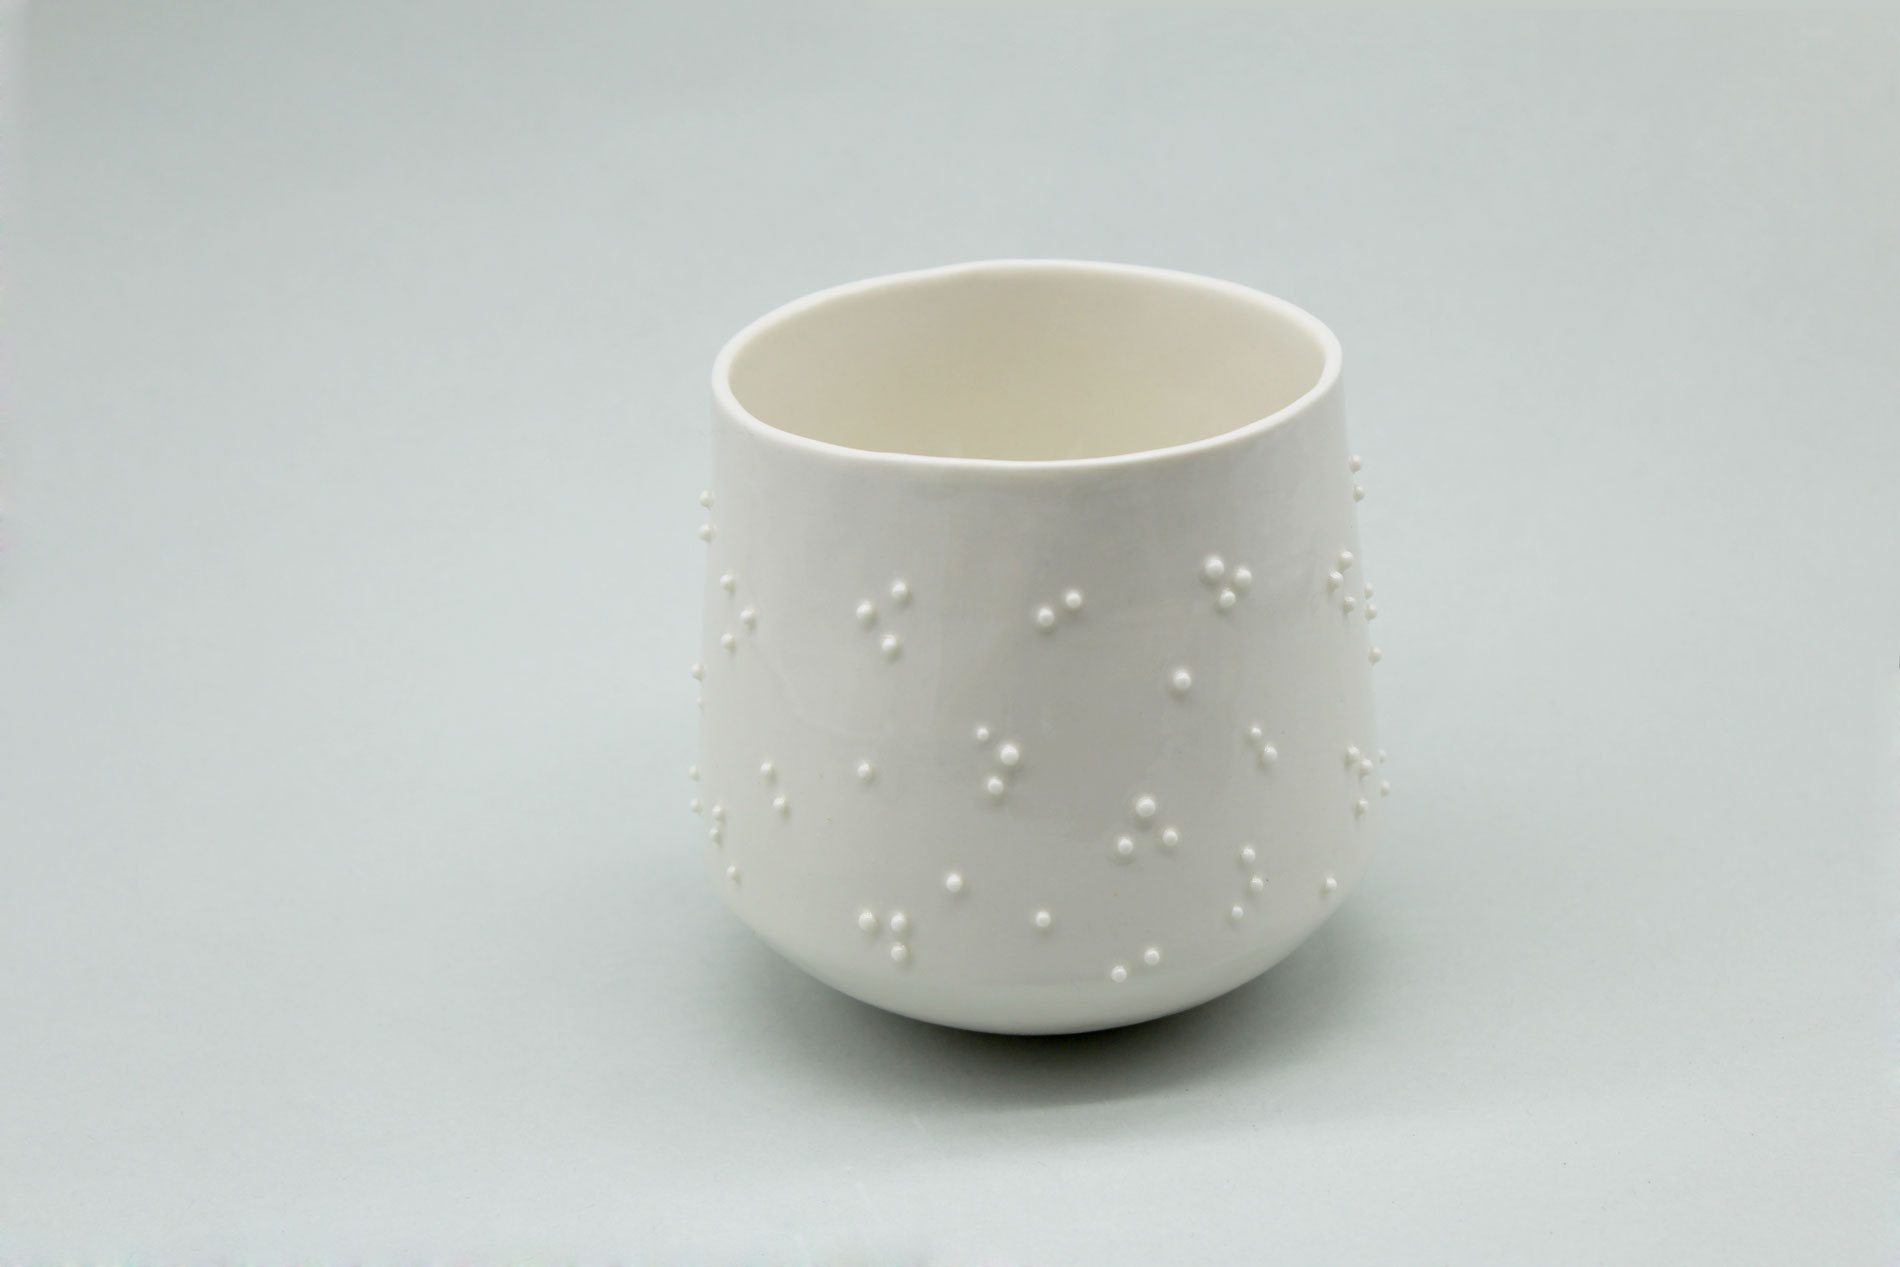 tasse porcelaine 2